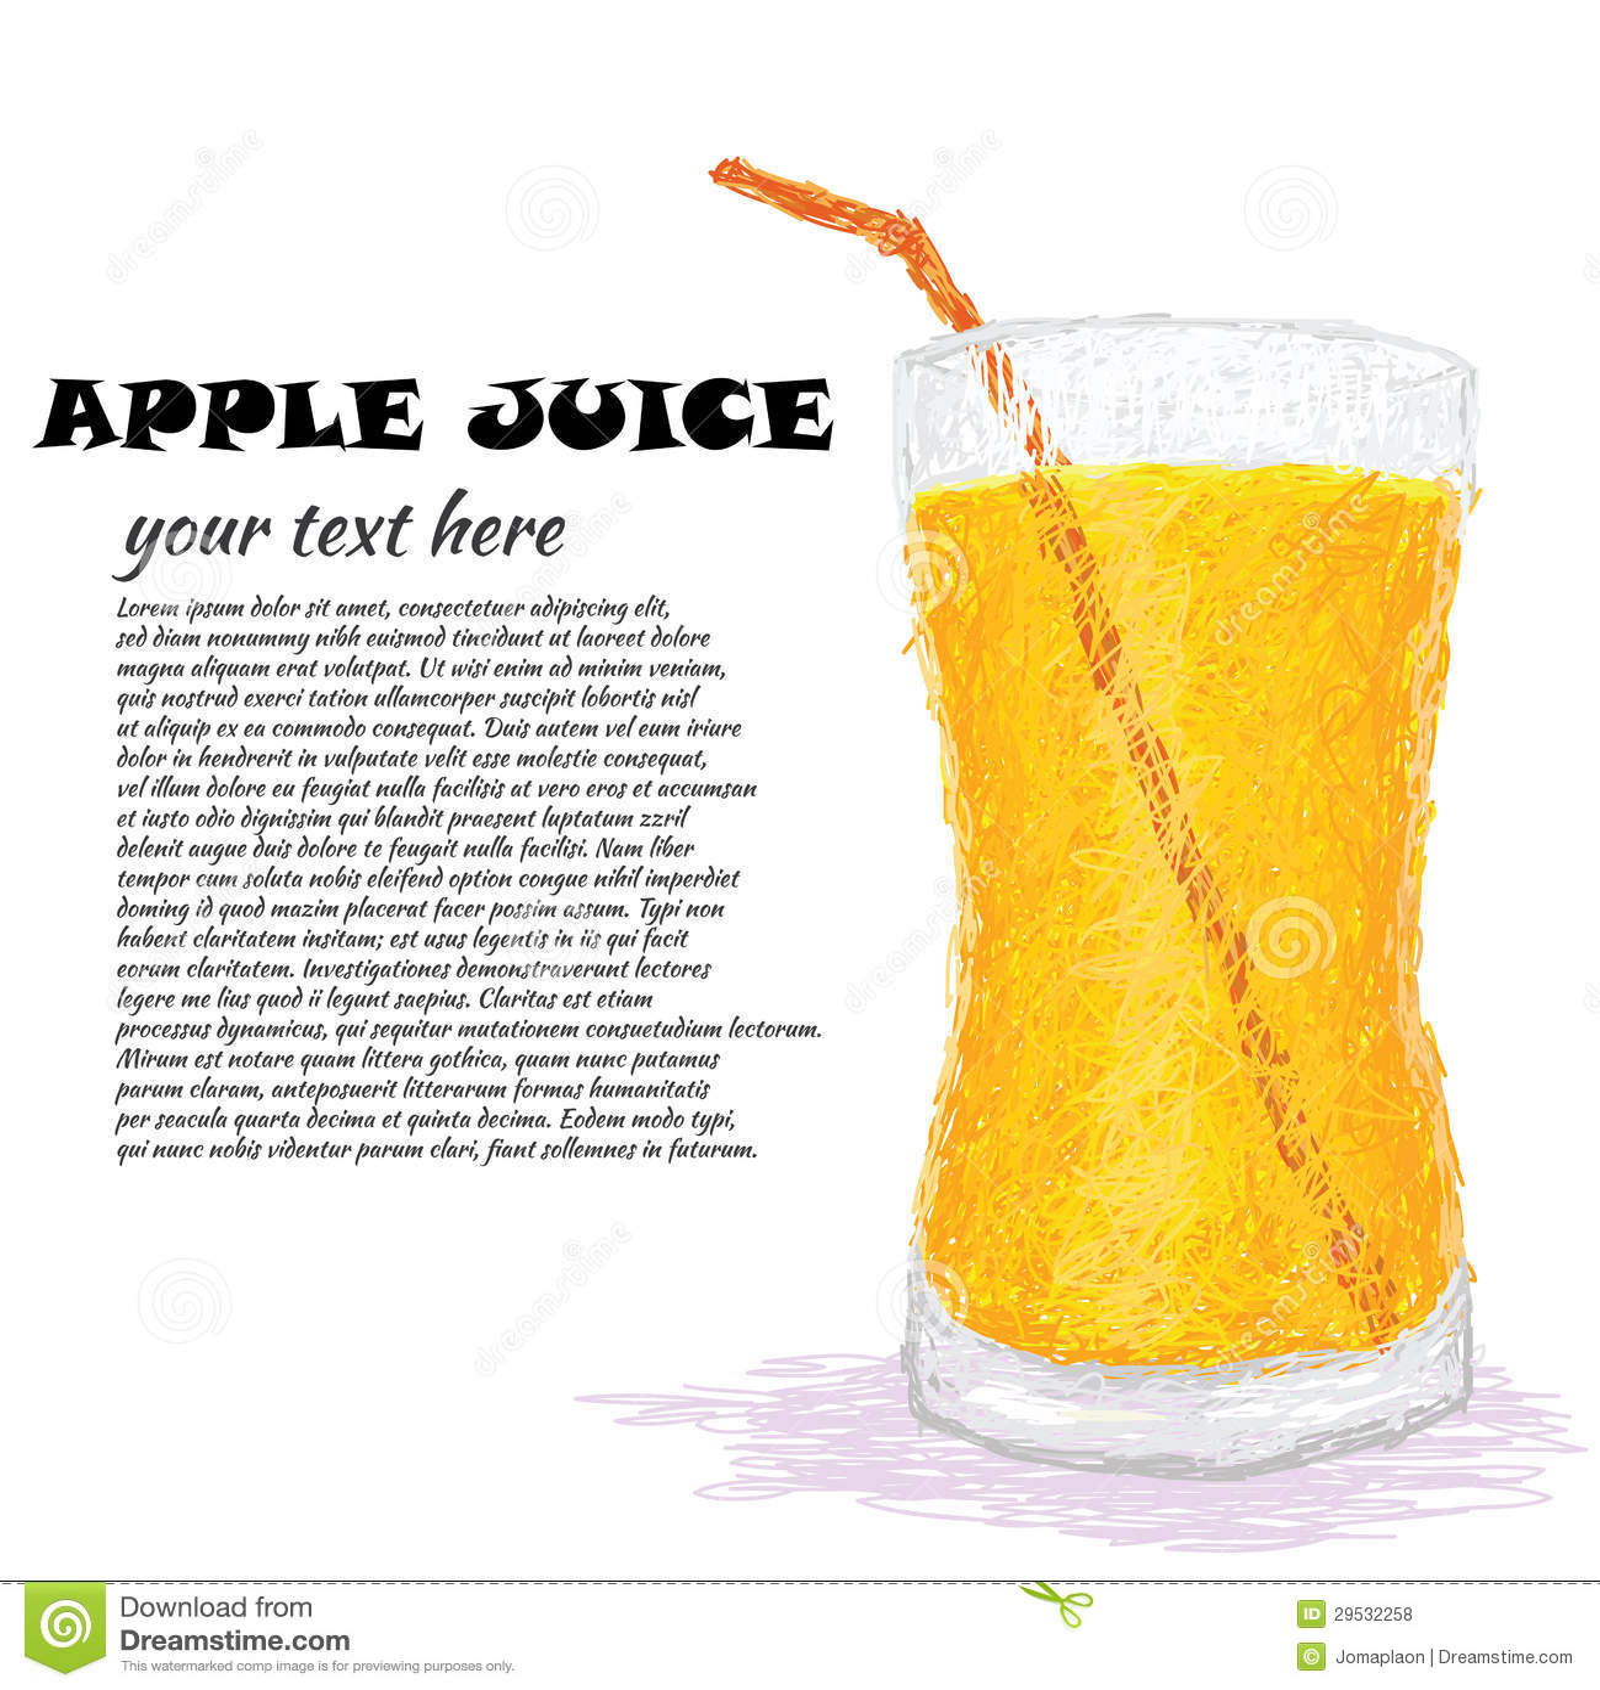 Sumo de maçã